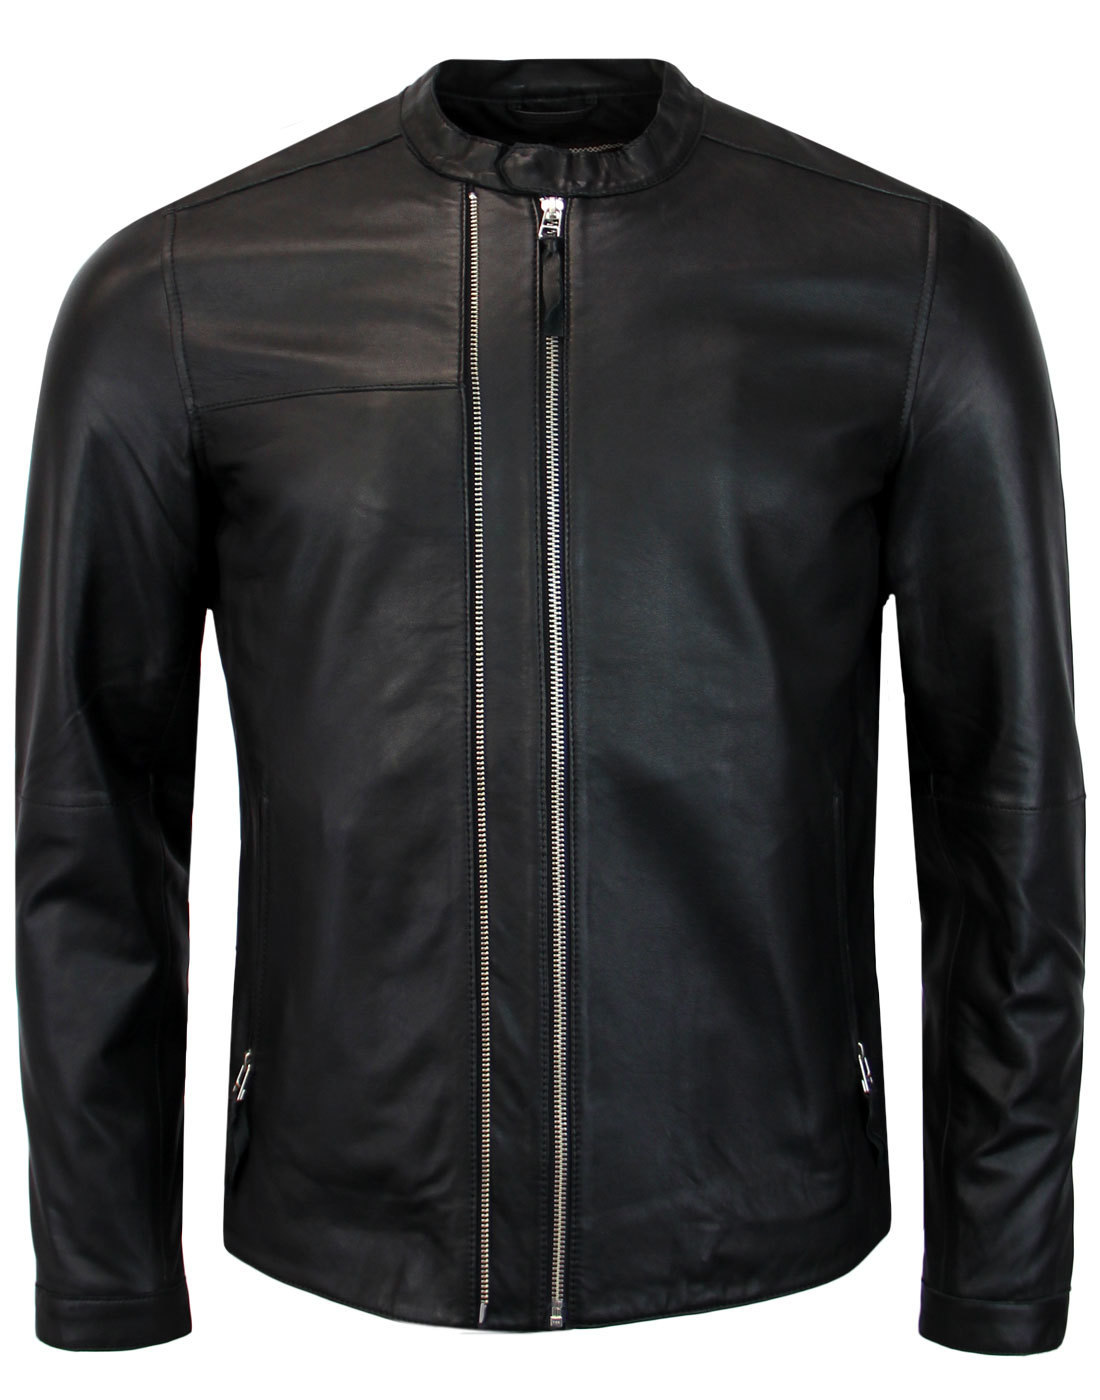 Burridge PRETTY GREEN Retro Leather Racer Jacket B